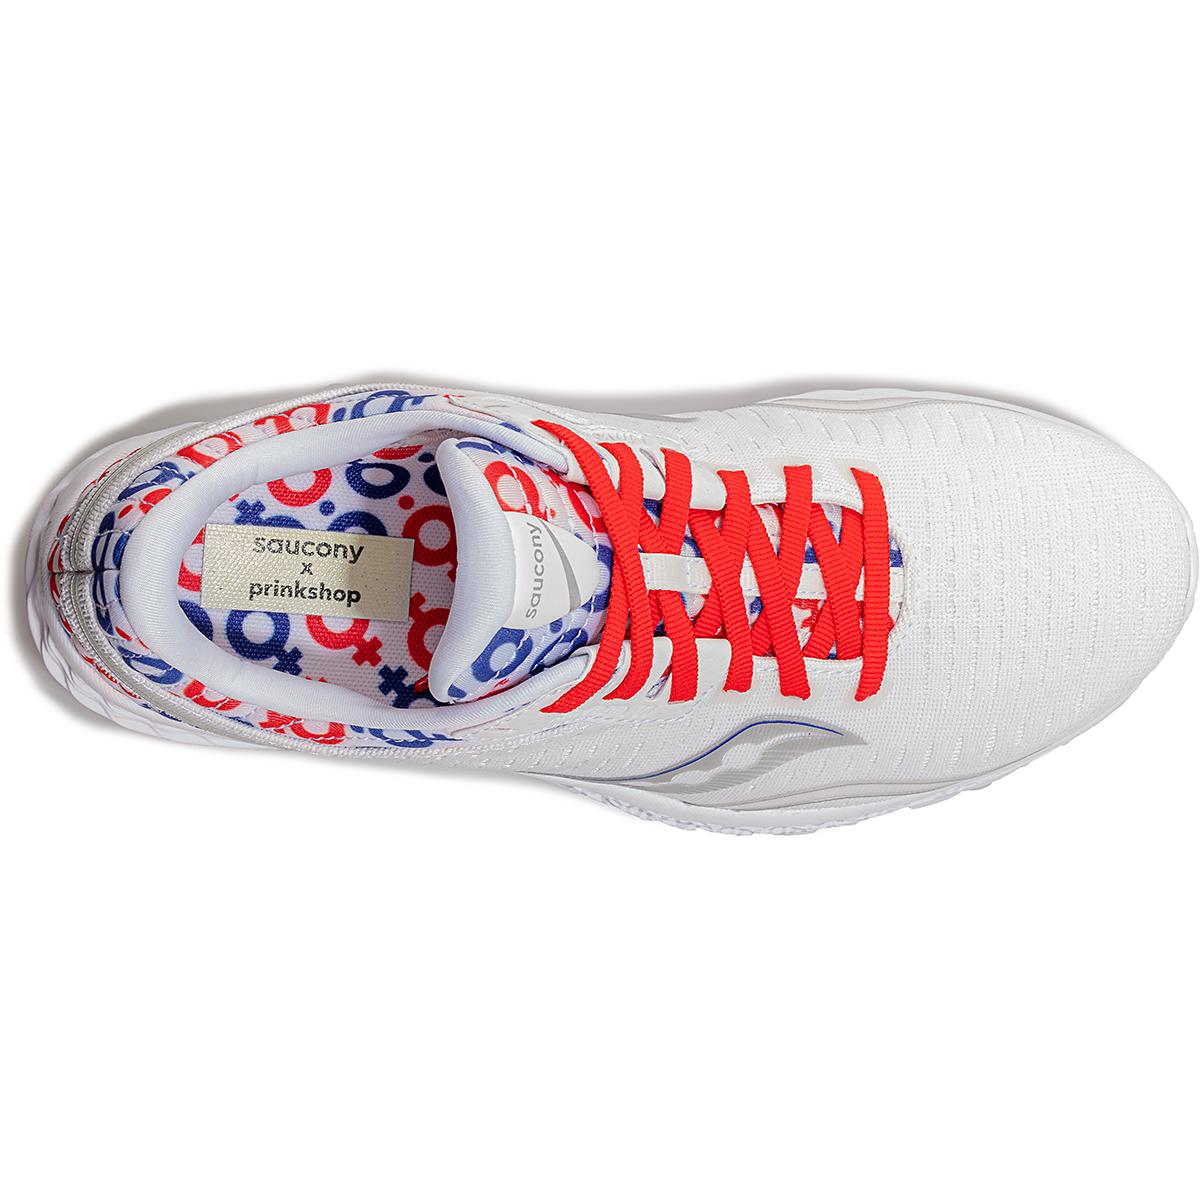 Women's Saucony x Prinkshop Hero Kinvara 11 Running Shoe - Color: Red/White/Blue - Size: 5 - Width: Regular, Red/White/Blue, large, image 3